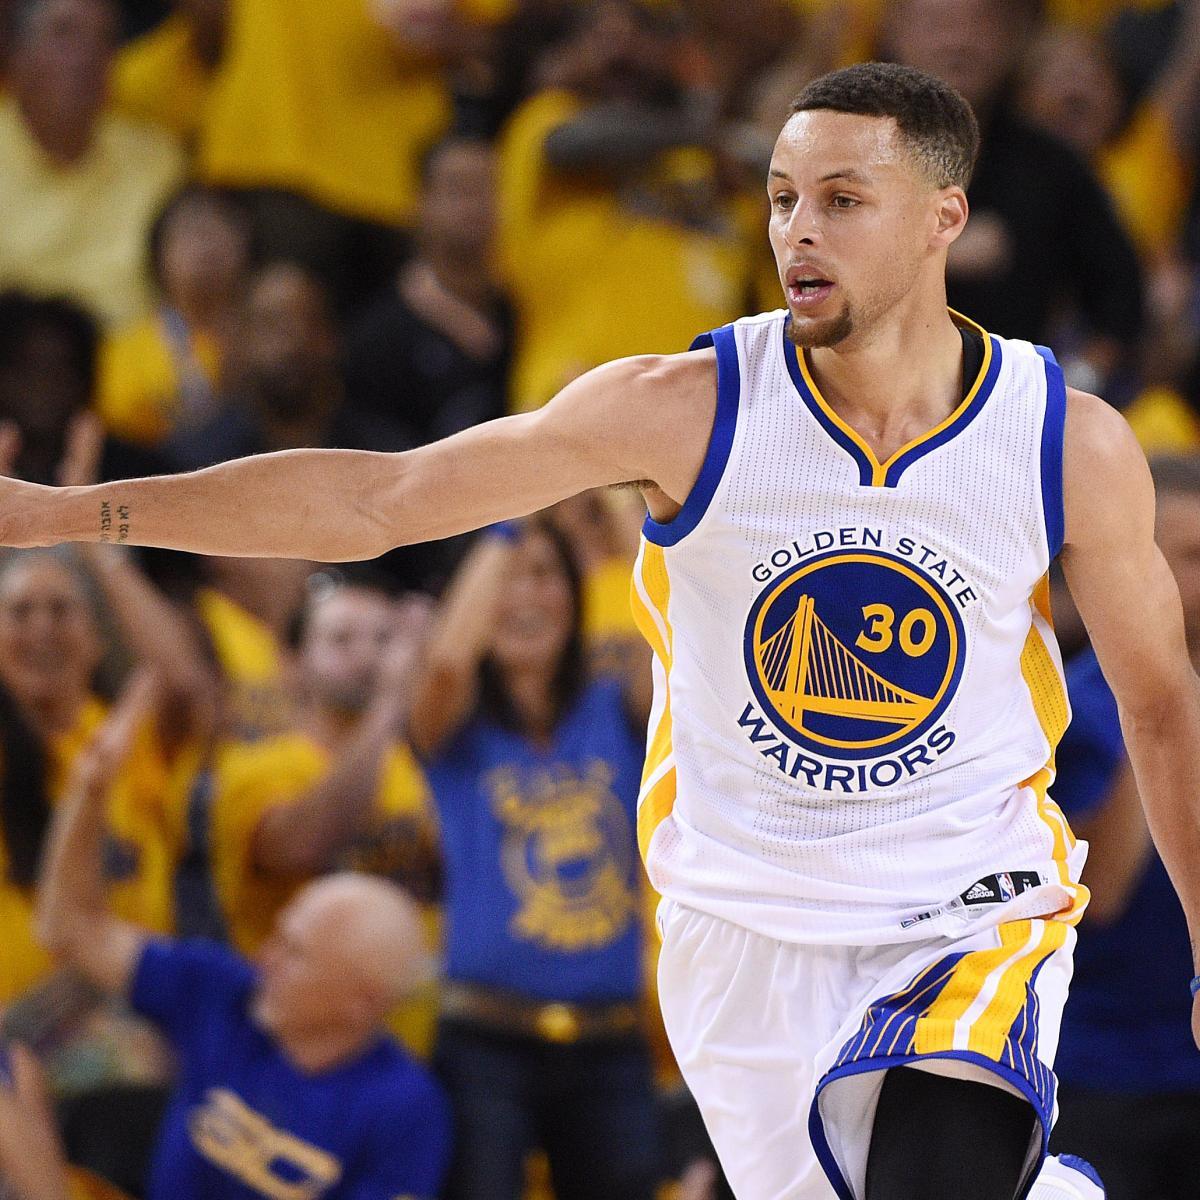 Warriors Game Live Stream Free Espn: Warriors Vs. Cavaliers: Game 3 Date, Live-Stream Schedule